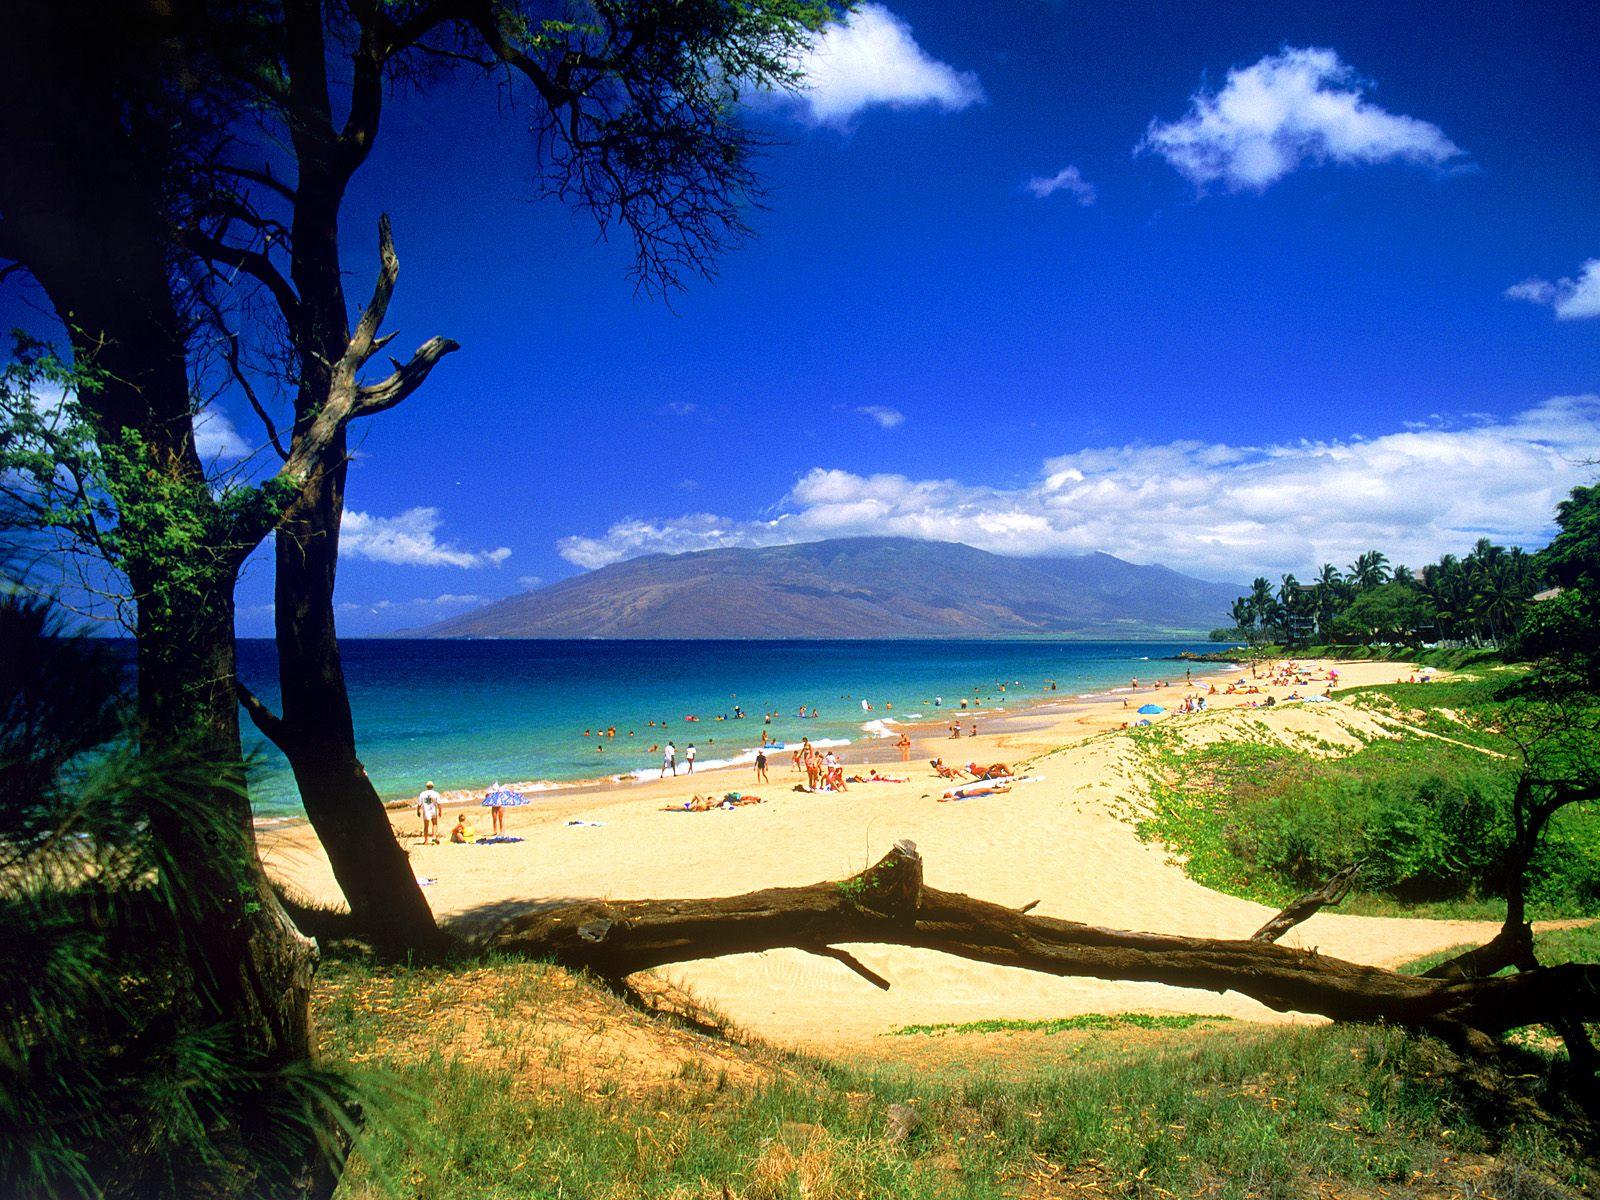 http://2.bp.blogspot.com/-oGi0nYMi9M0/TeZa9r3PVMI/AAAAAAAAAiM/KE-z8pg0poM/s1600/Kihei+Beach+Maui+Hawaii.jpg